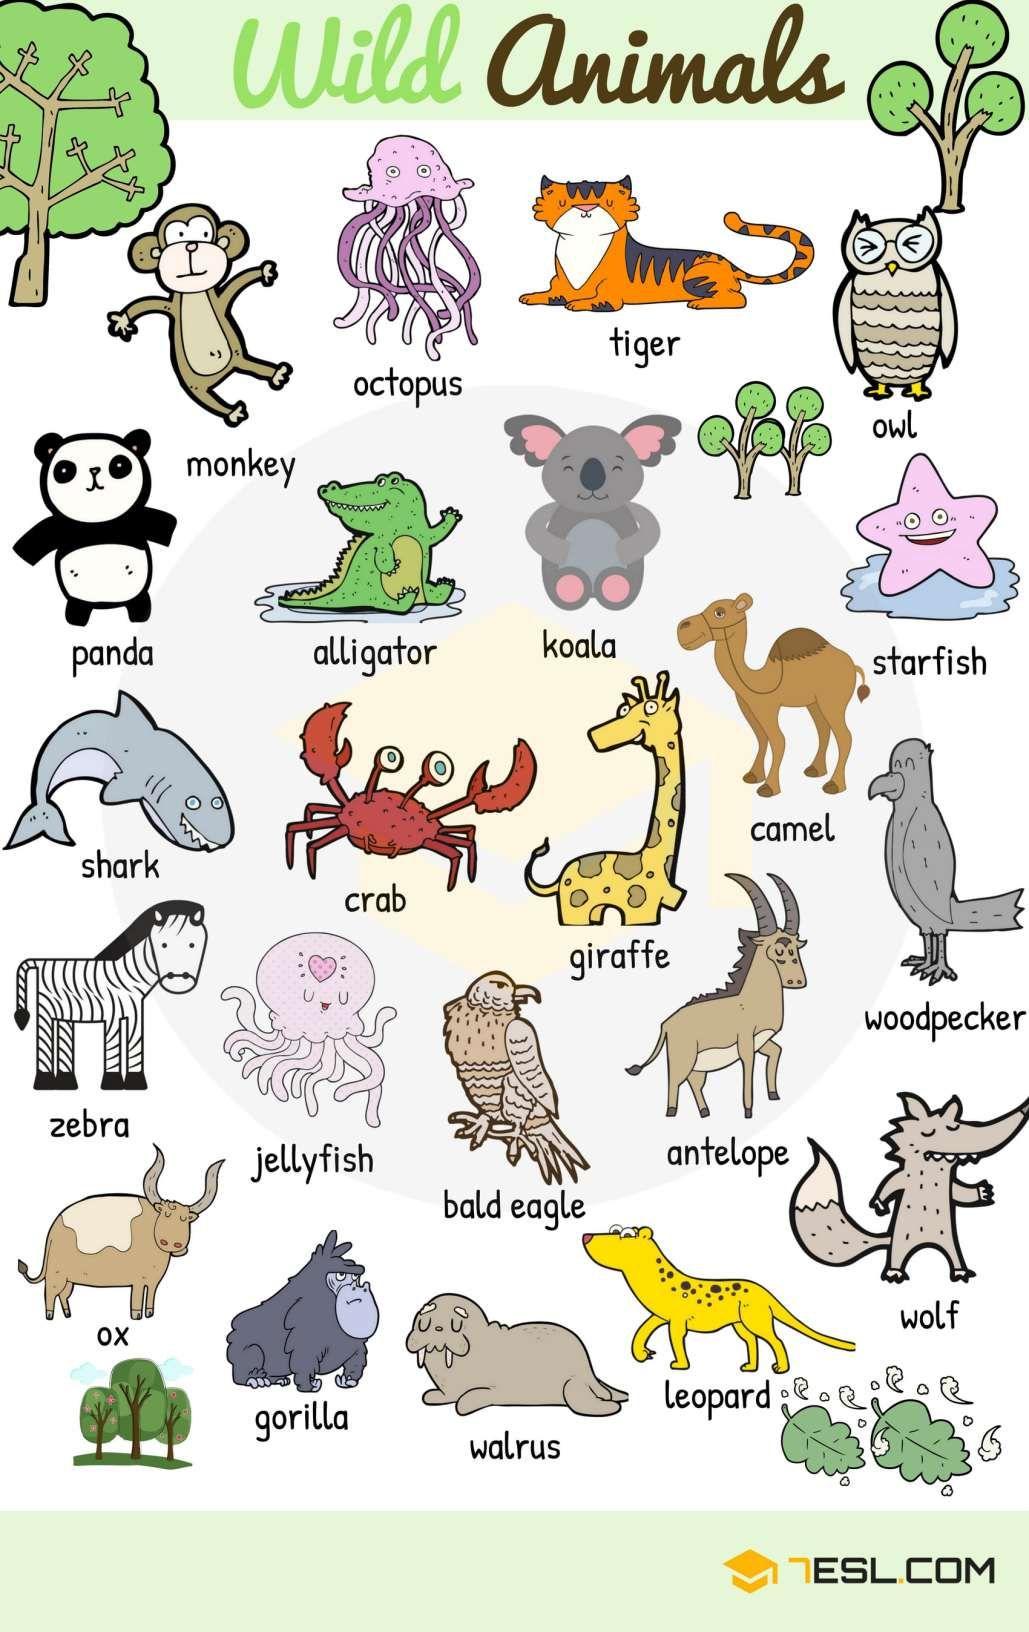 Learn Animal Names In English Teaching English Ingleses Ensino De Ingles E Aulas De Ingles